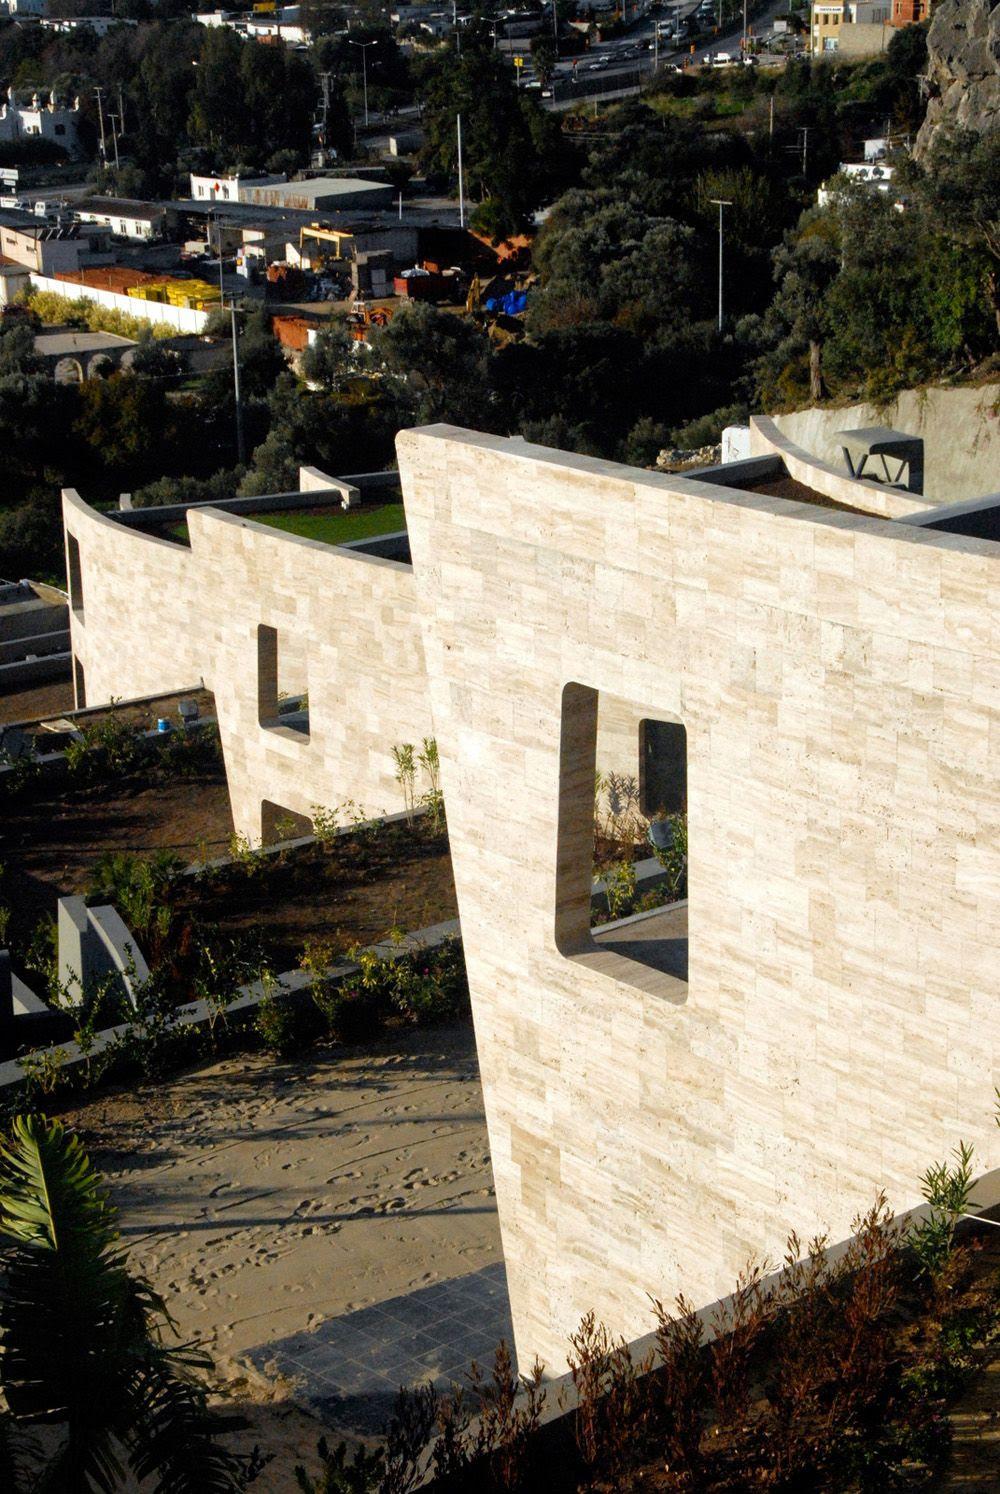 CastleRock - GAD + Dara Kirmizitoprak, arquitectura, casas, vivienda-colectiva